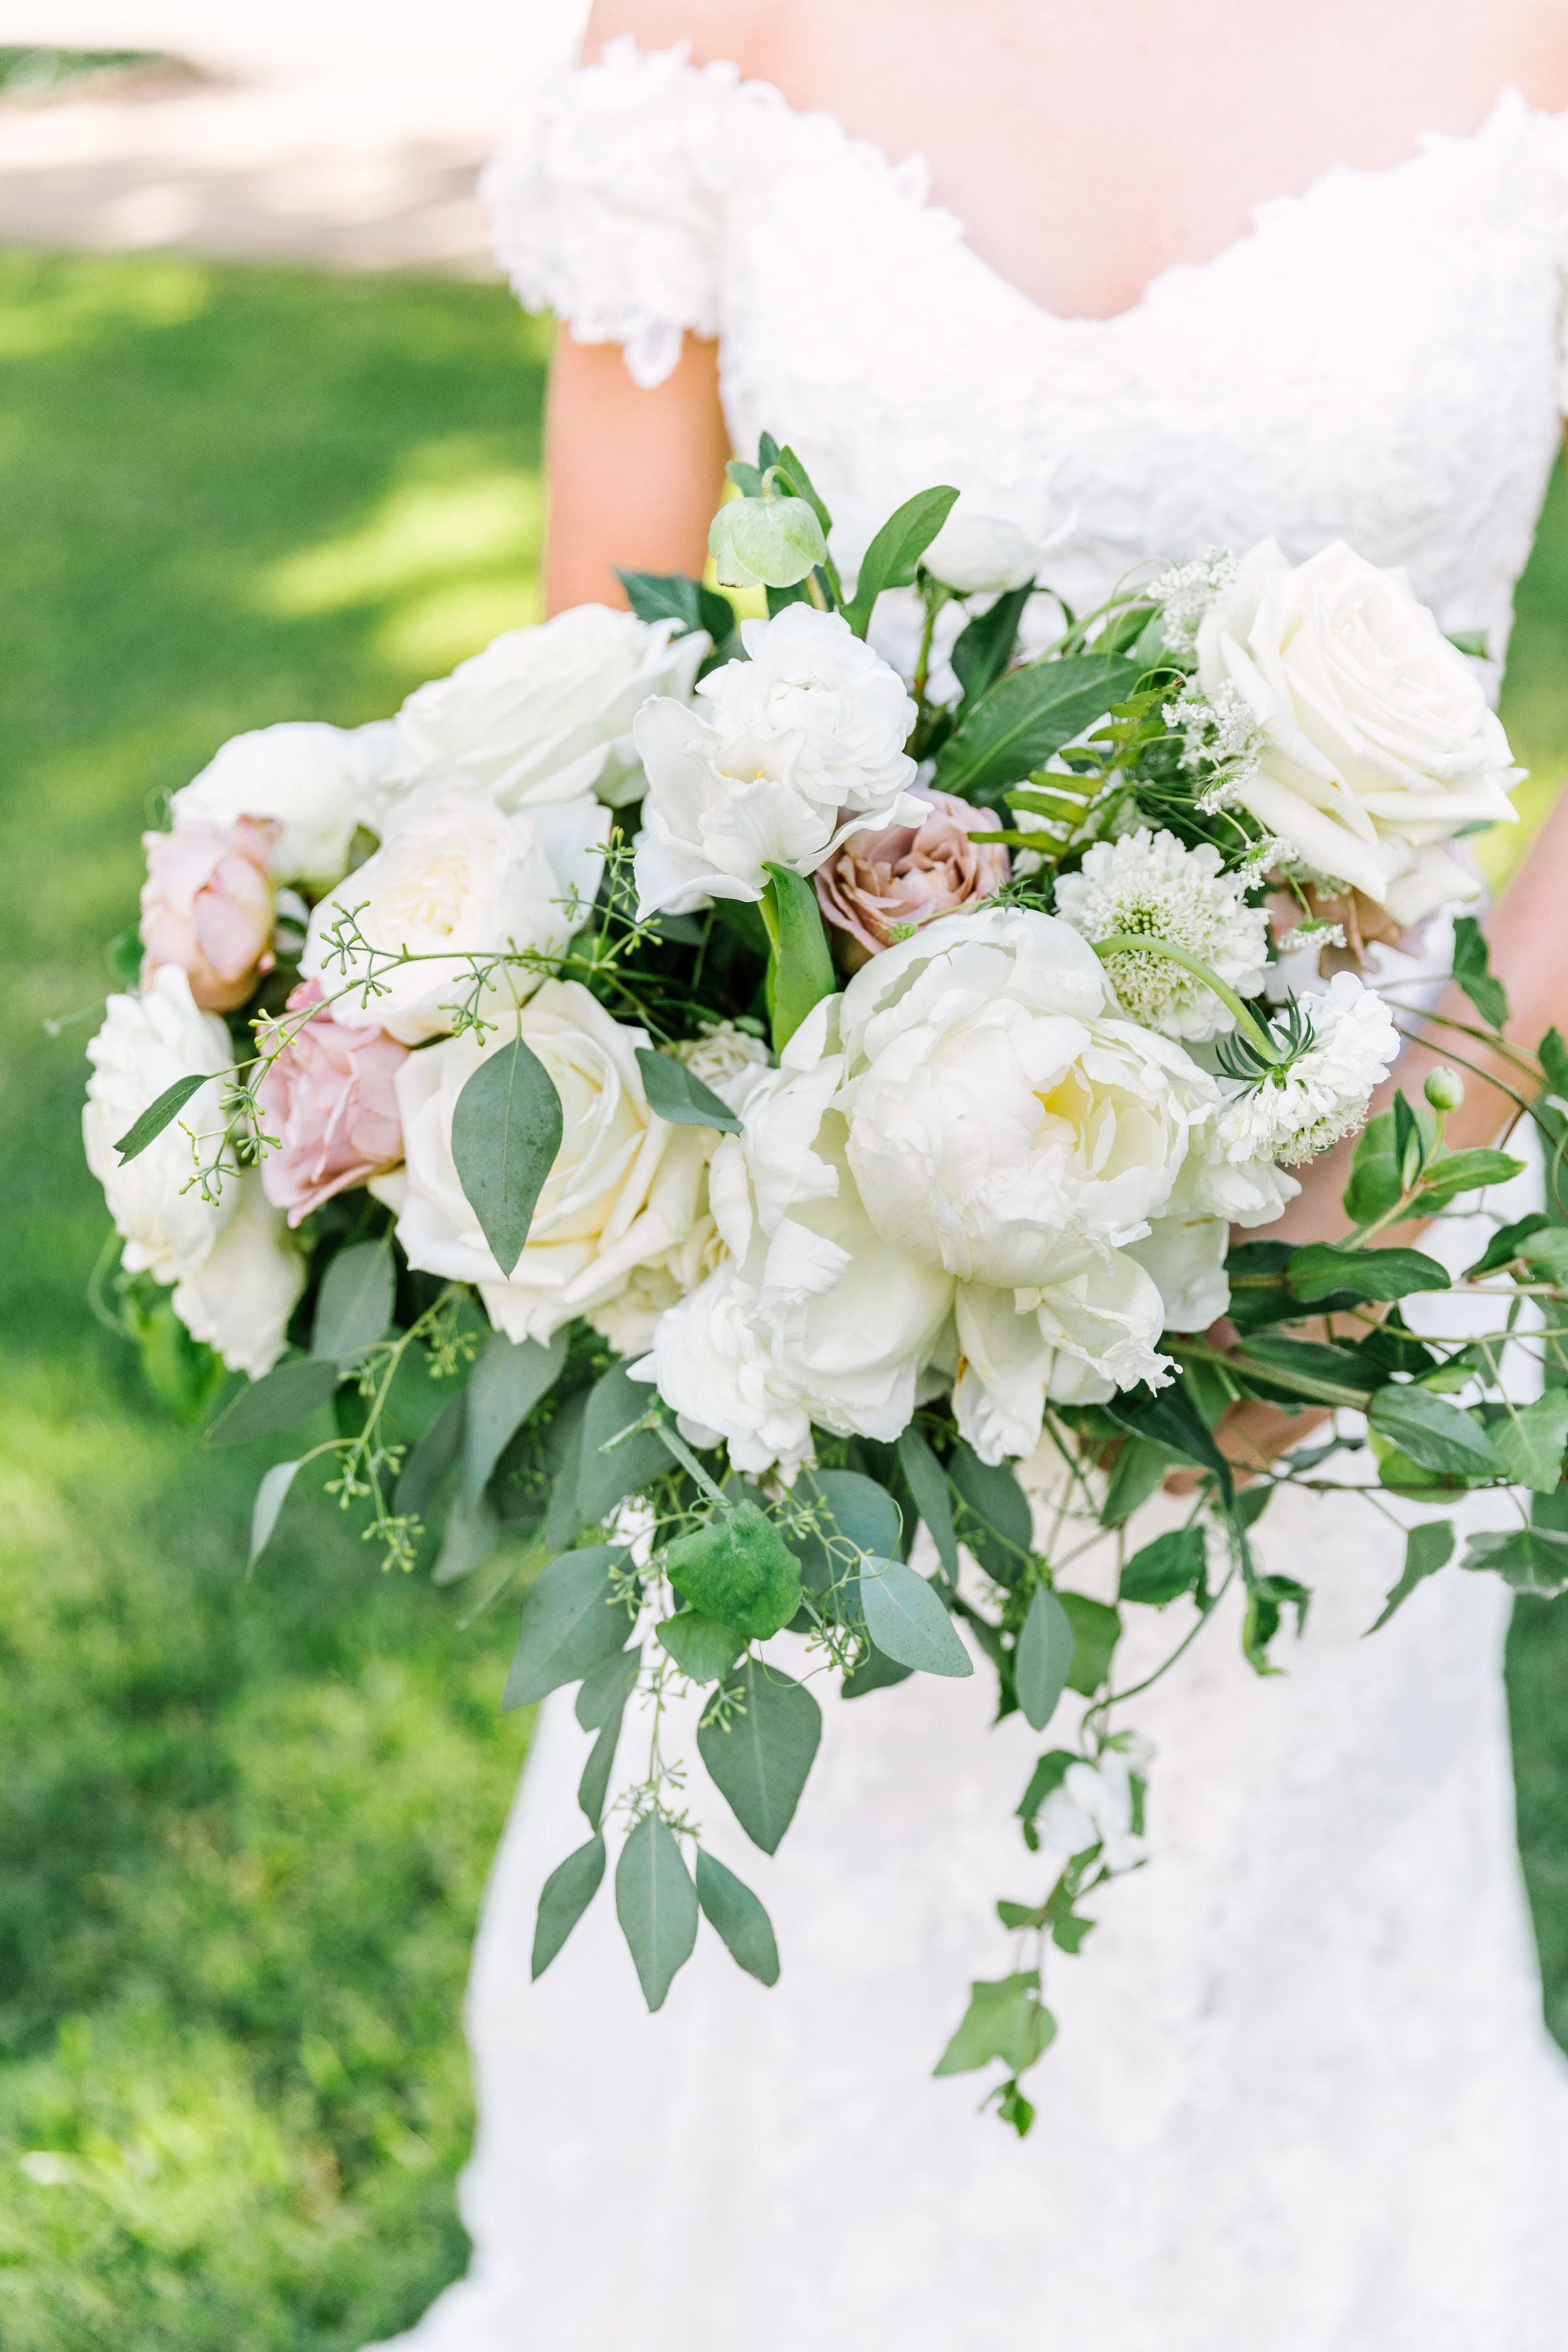 Ellen-Ashton-Photography-Girt-and-gold-events-weddings-Ashton-Depot-Weddings224.jpg